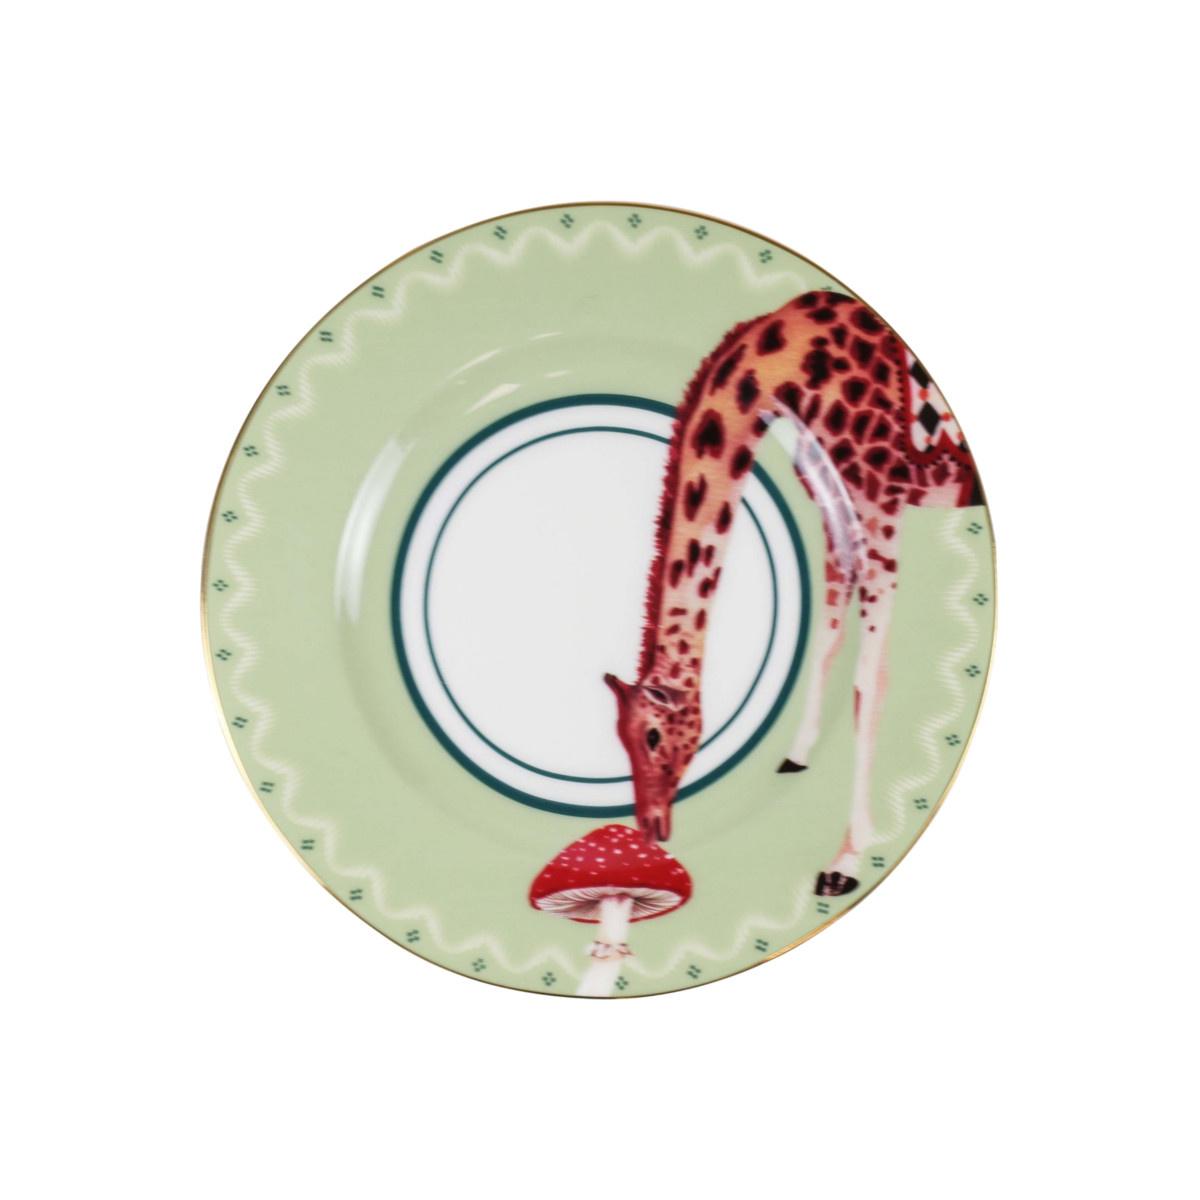 Yvonne Ellen London Yvonne Ellen London Carnival Animal 4-er Set Teller Ø 16 cm - Bone China Porzellan - In schöner Geschenkbox